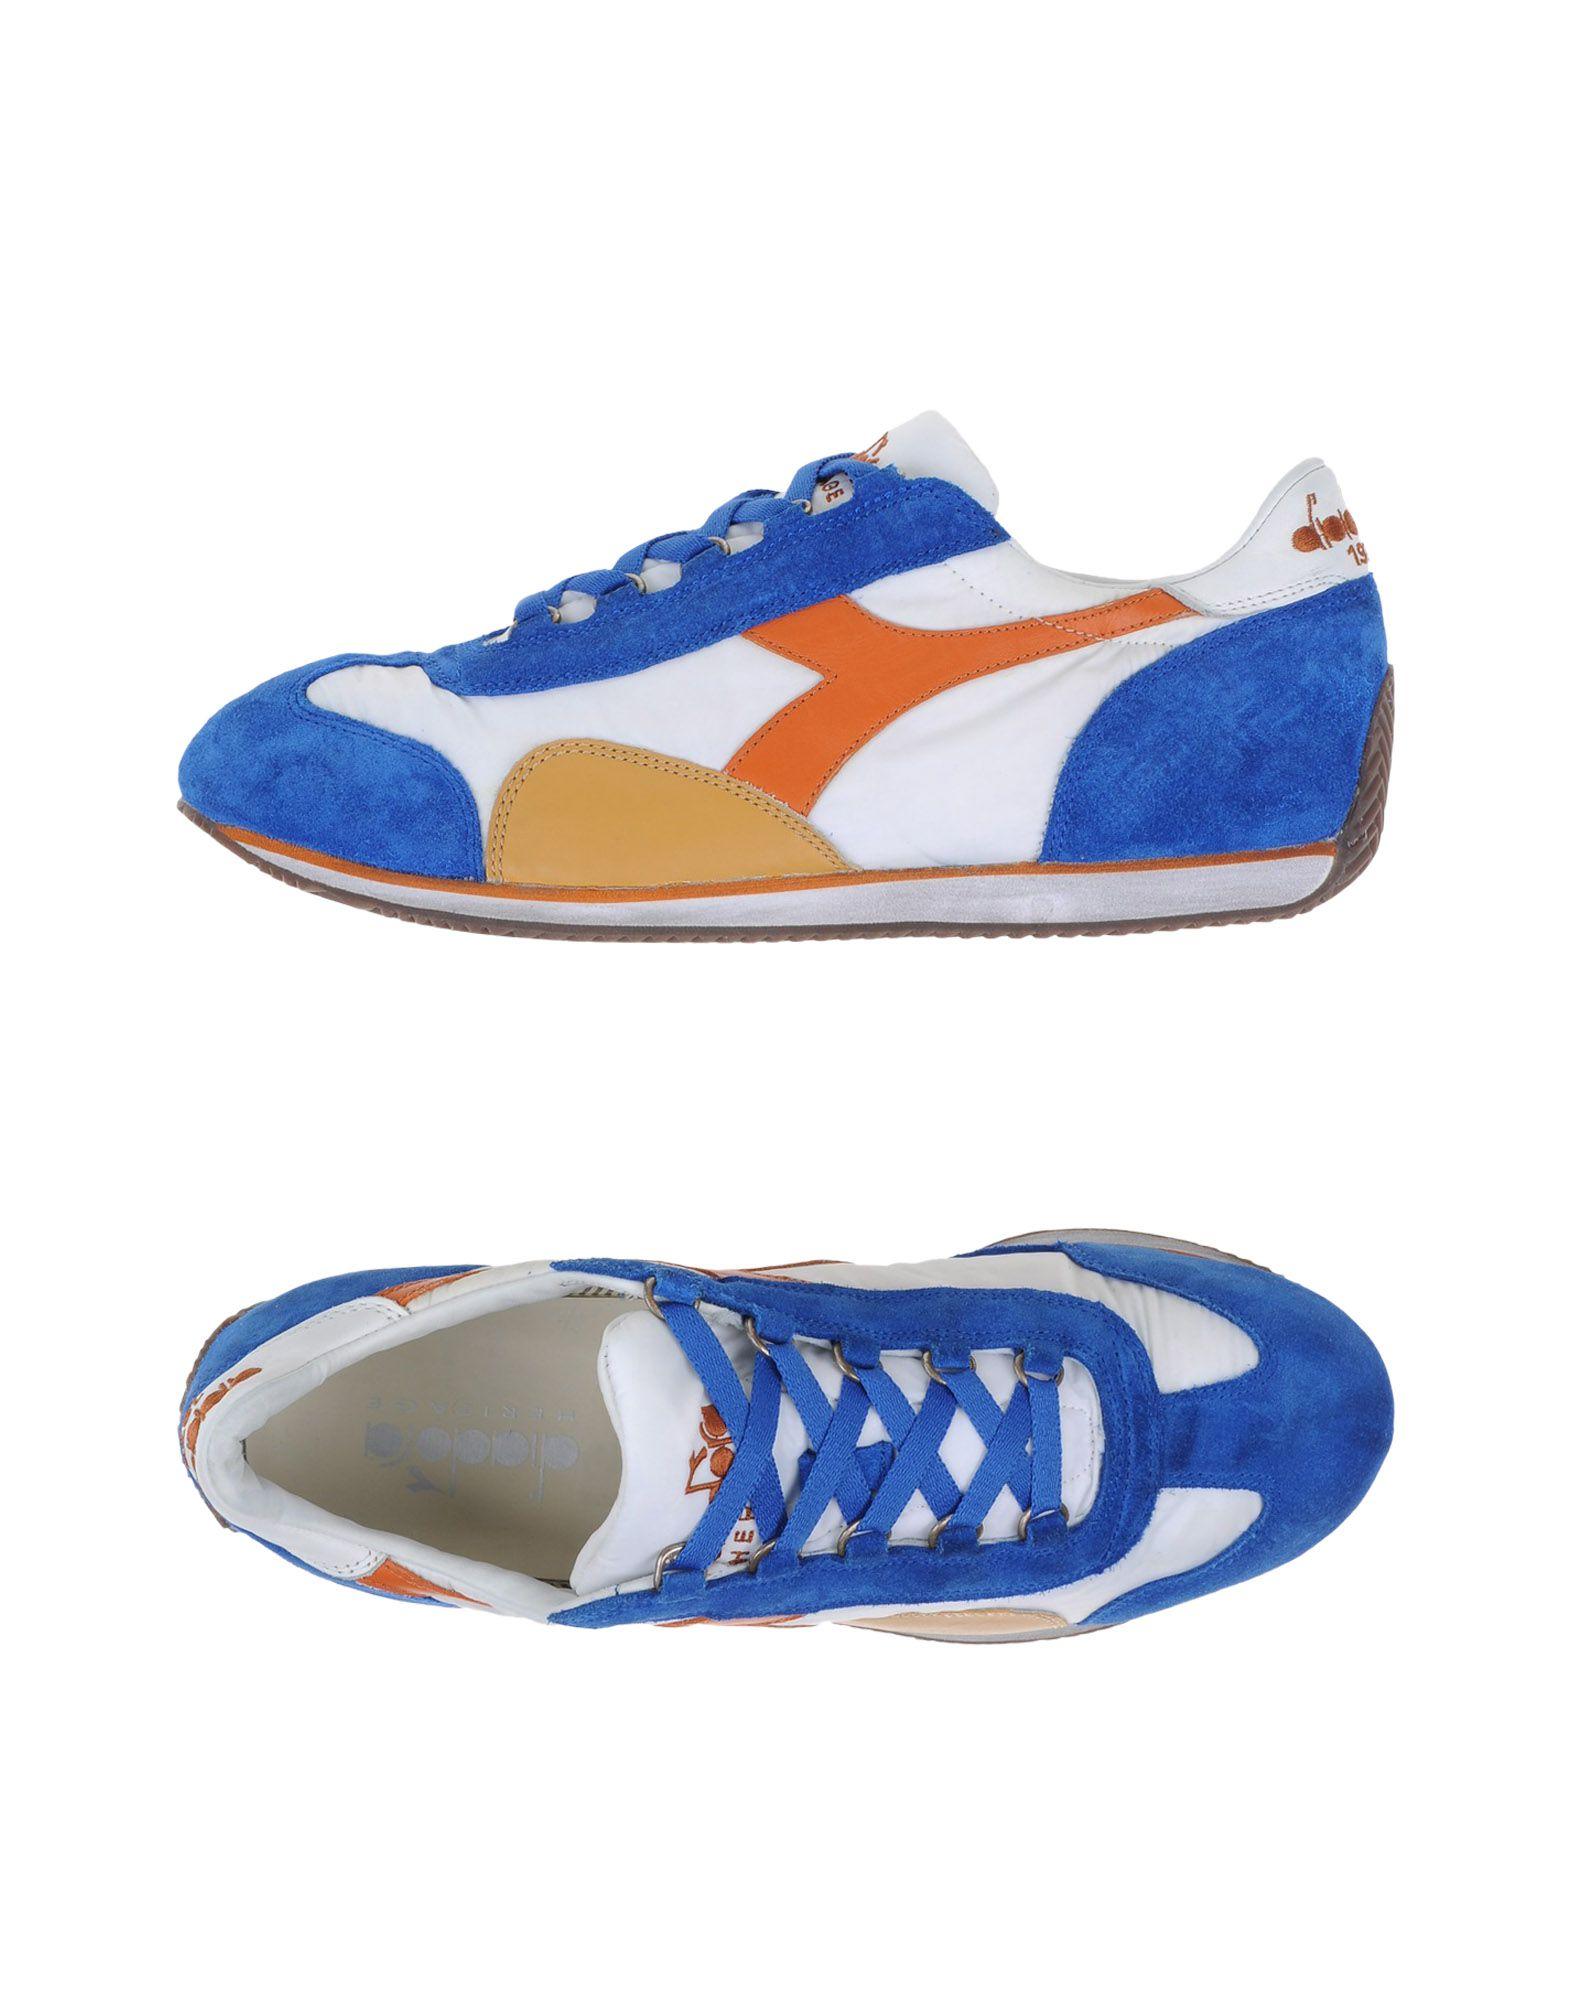 Sneakers Diadora Heritage Equipe Nyl Sw Waxed - Homme - Sneakers Diadora Heritage sur